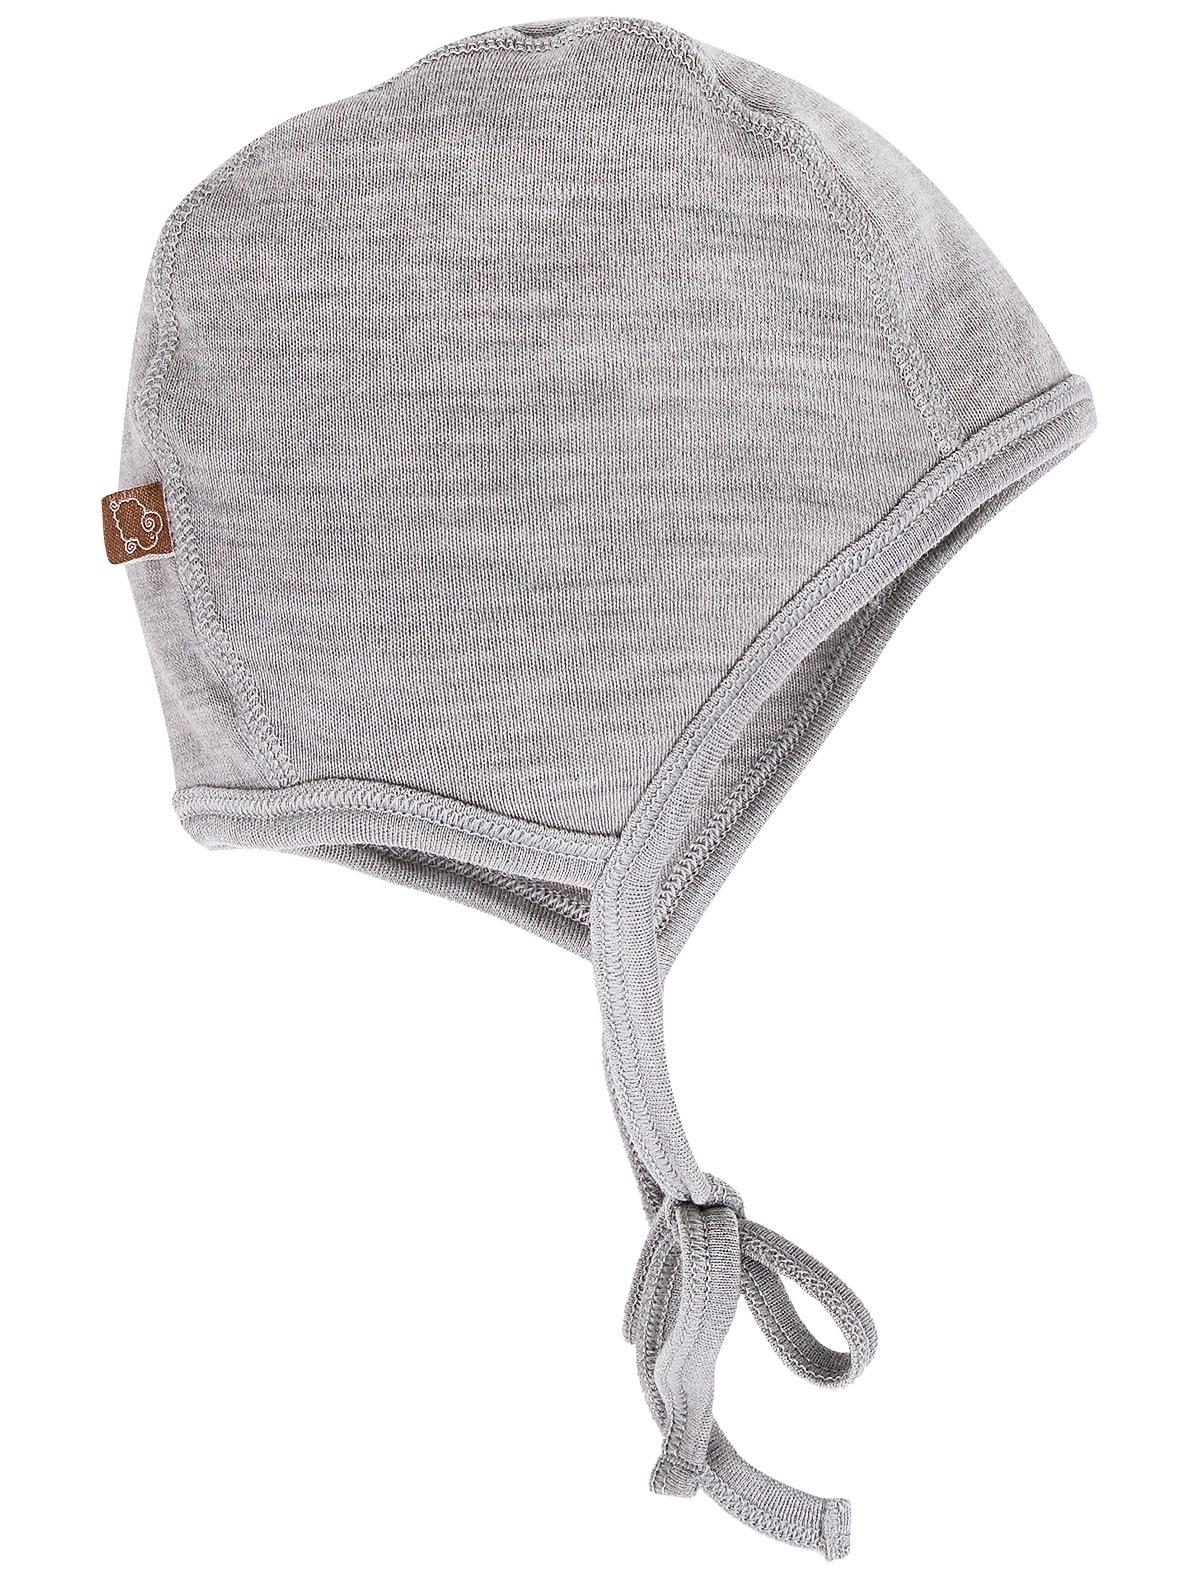 Купить 2249760, Шапка Air wool, серый, 1354529081057